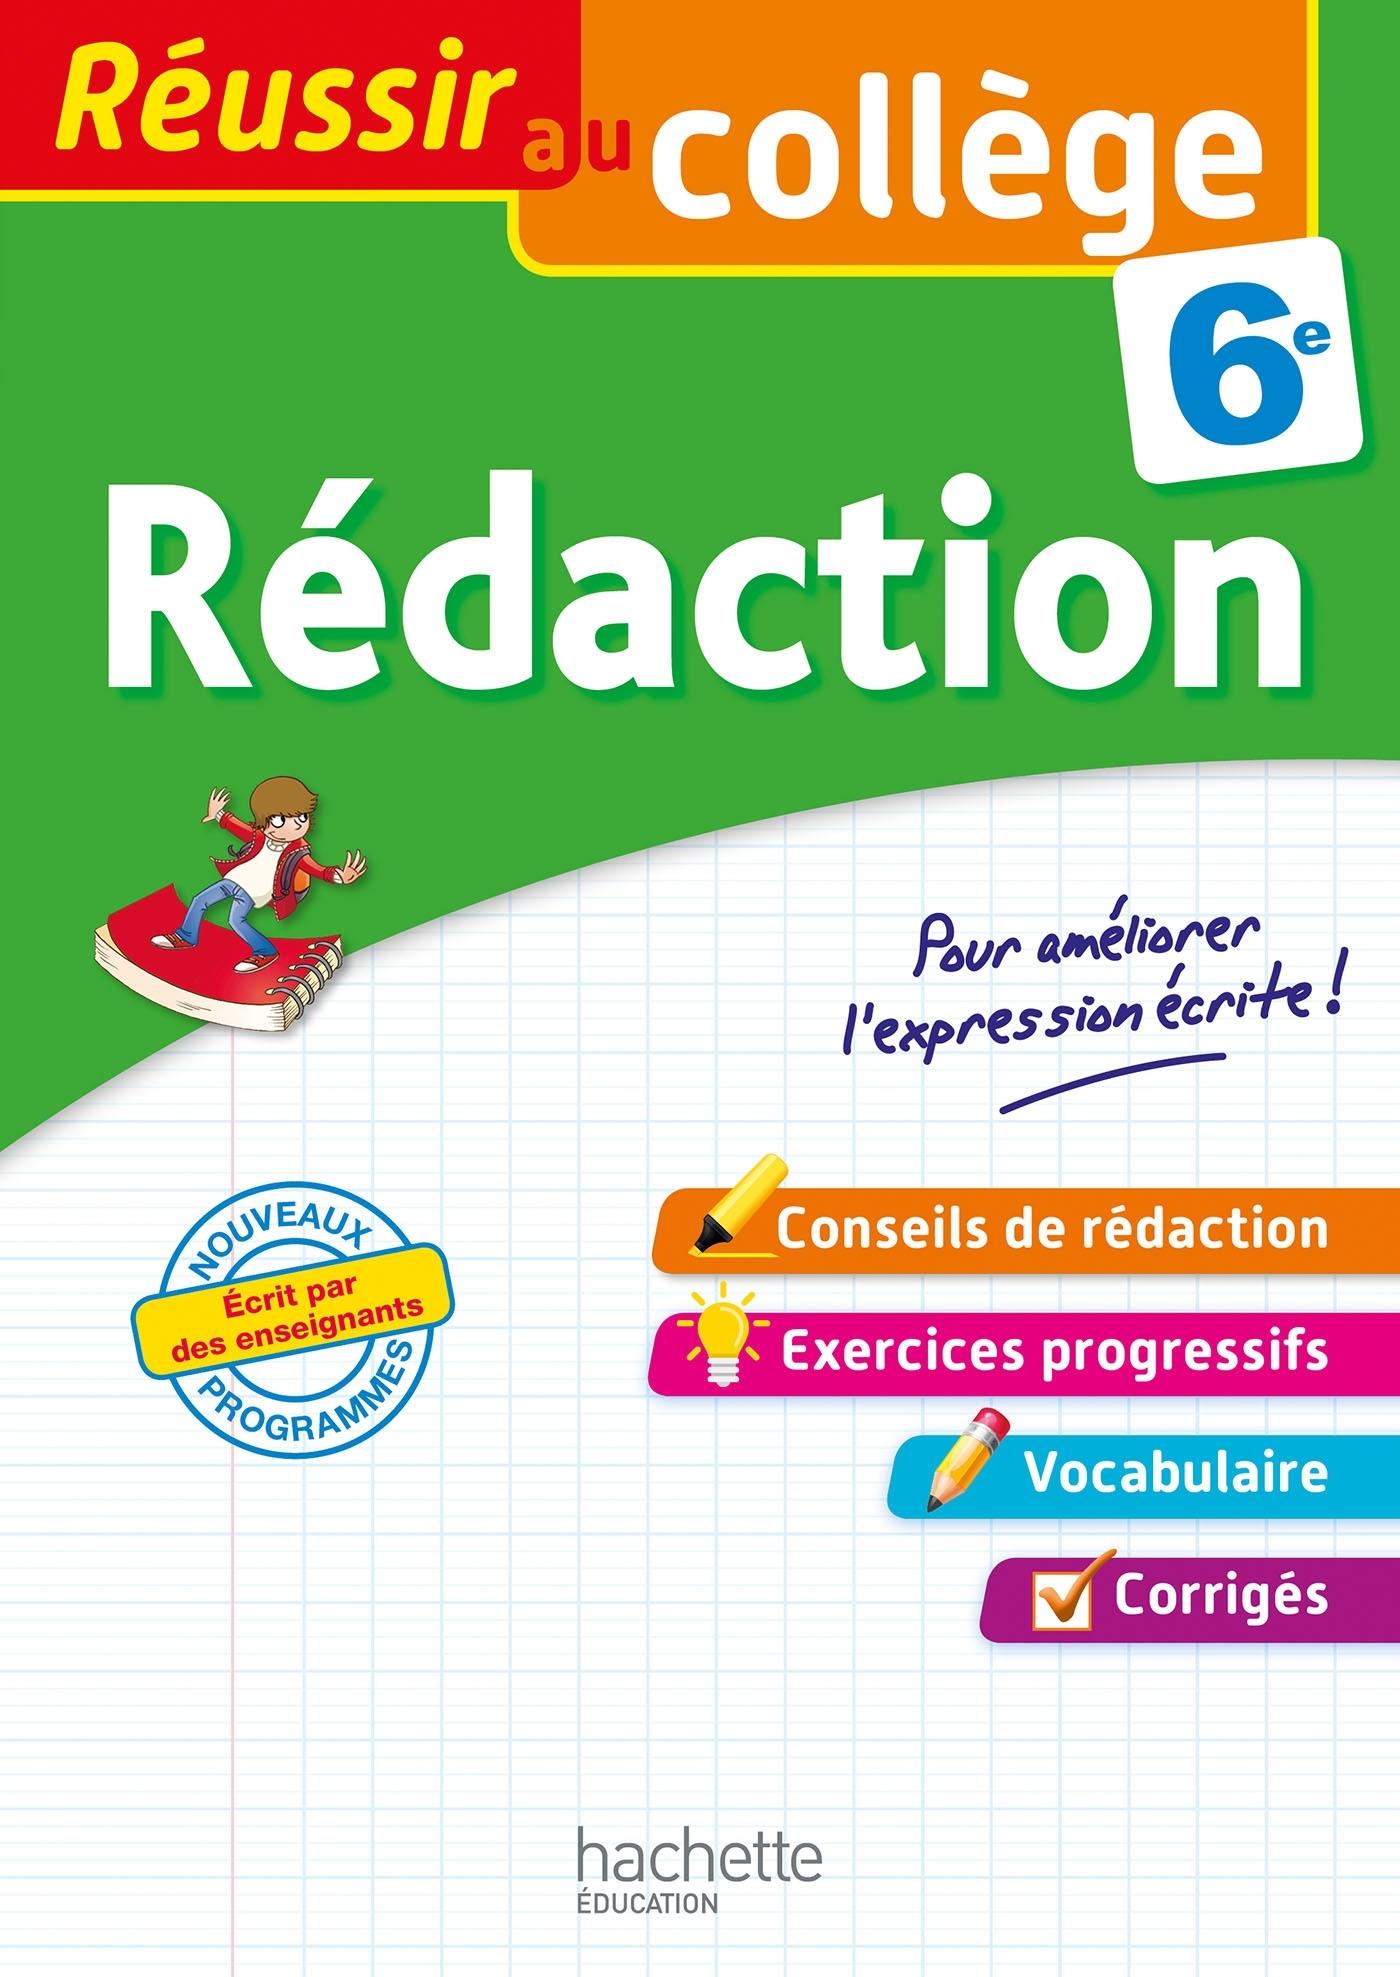 REUSSIR AU COLLEGE - REDACTION 6E